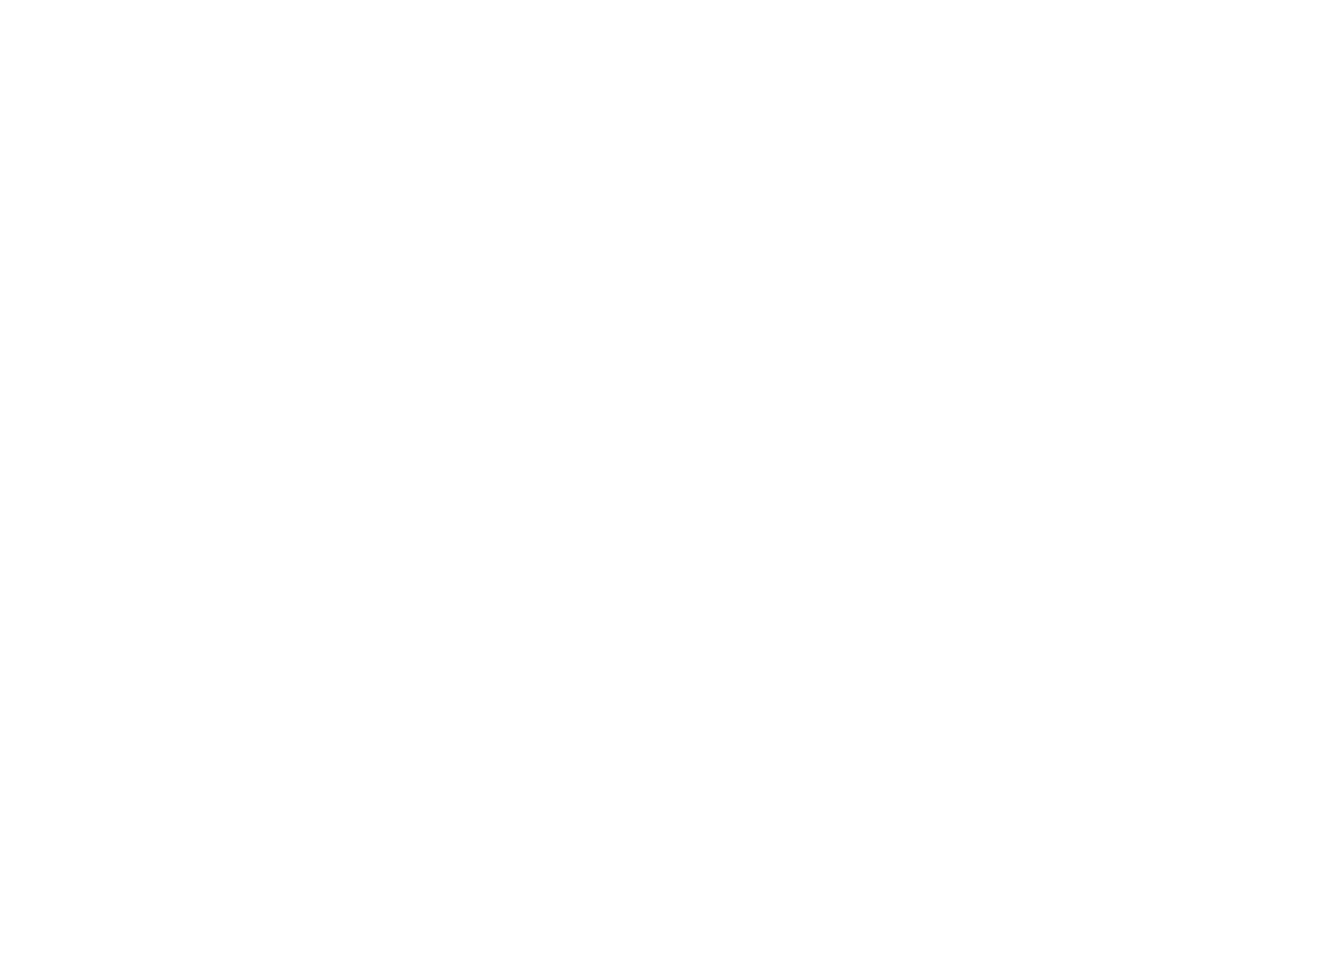 Static Logos Placeholder